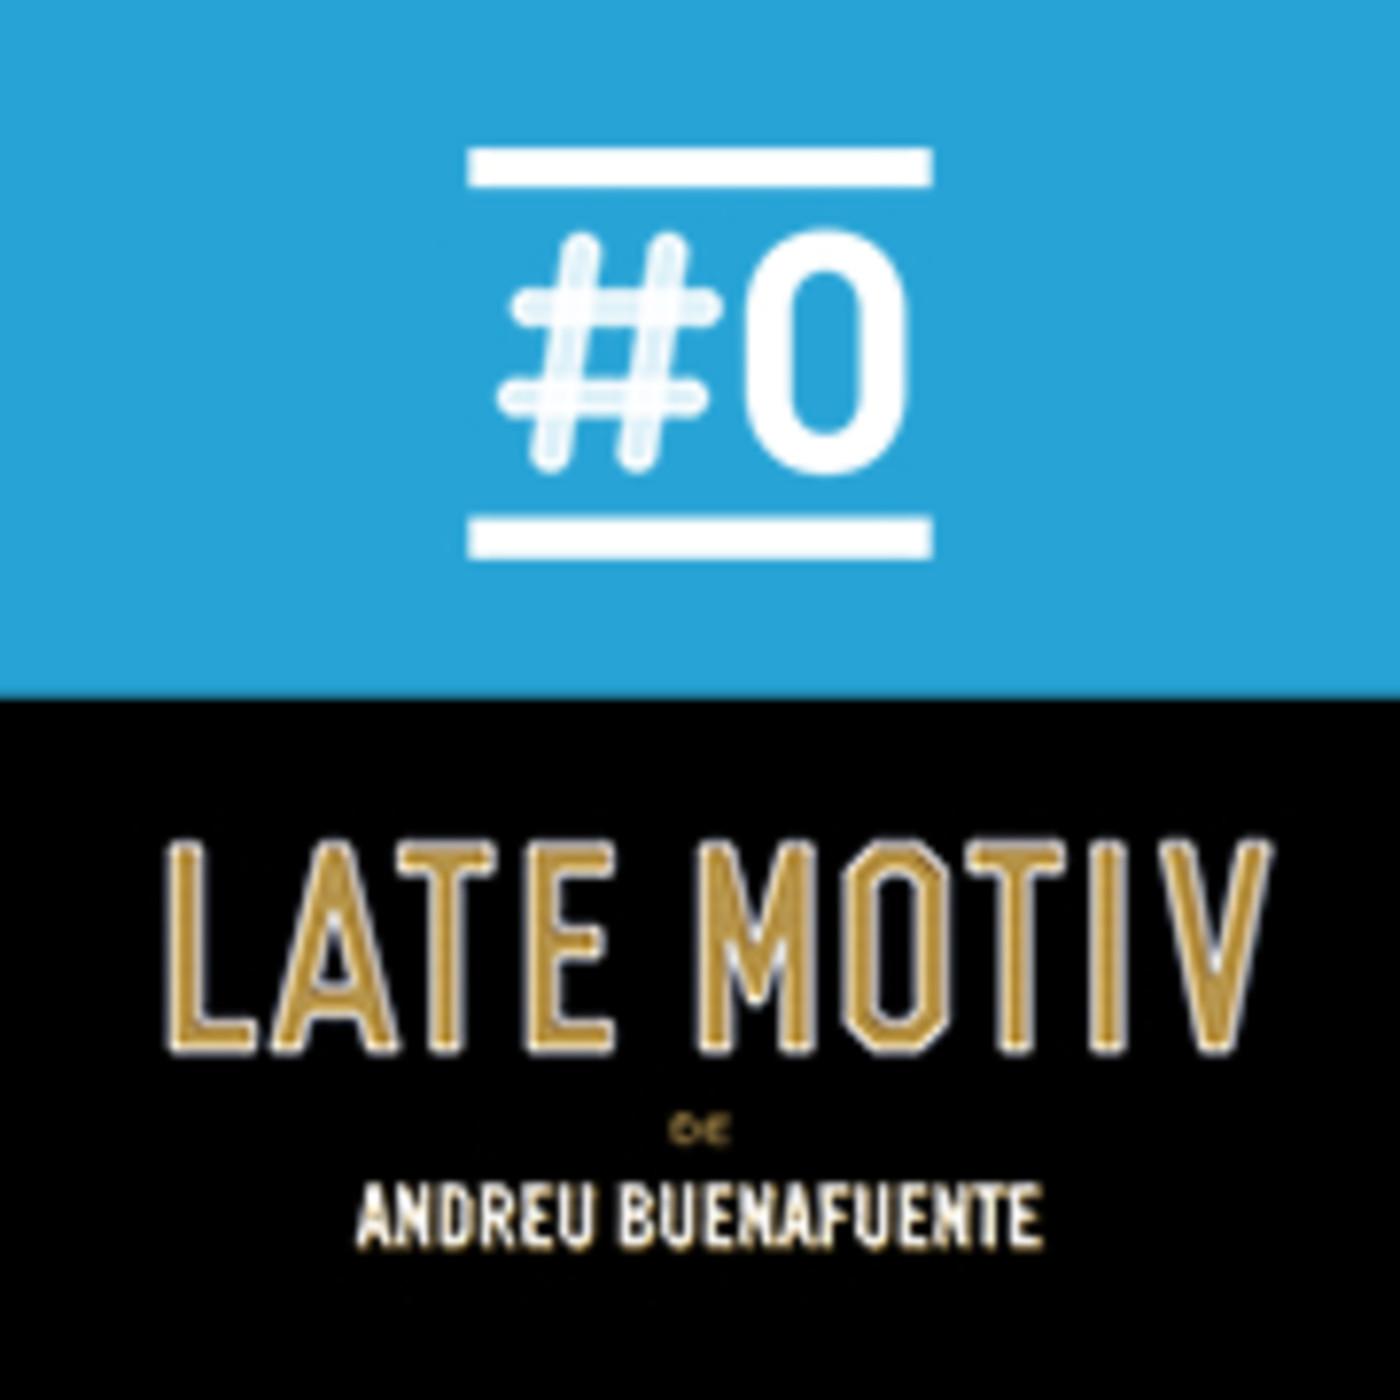 LATE MOTIV 575 - Programa completo